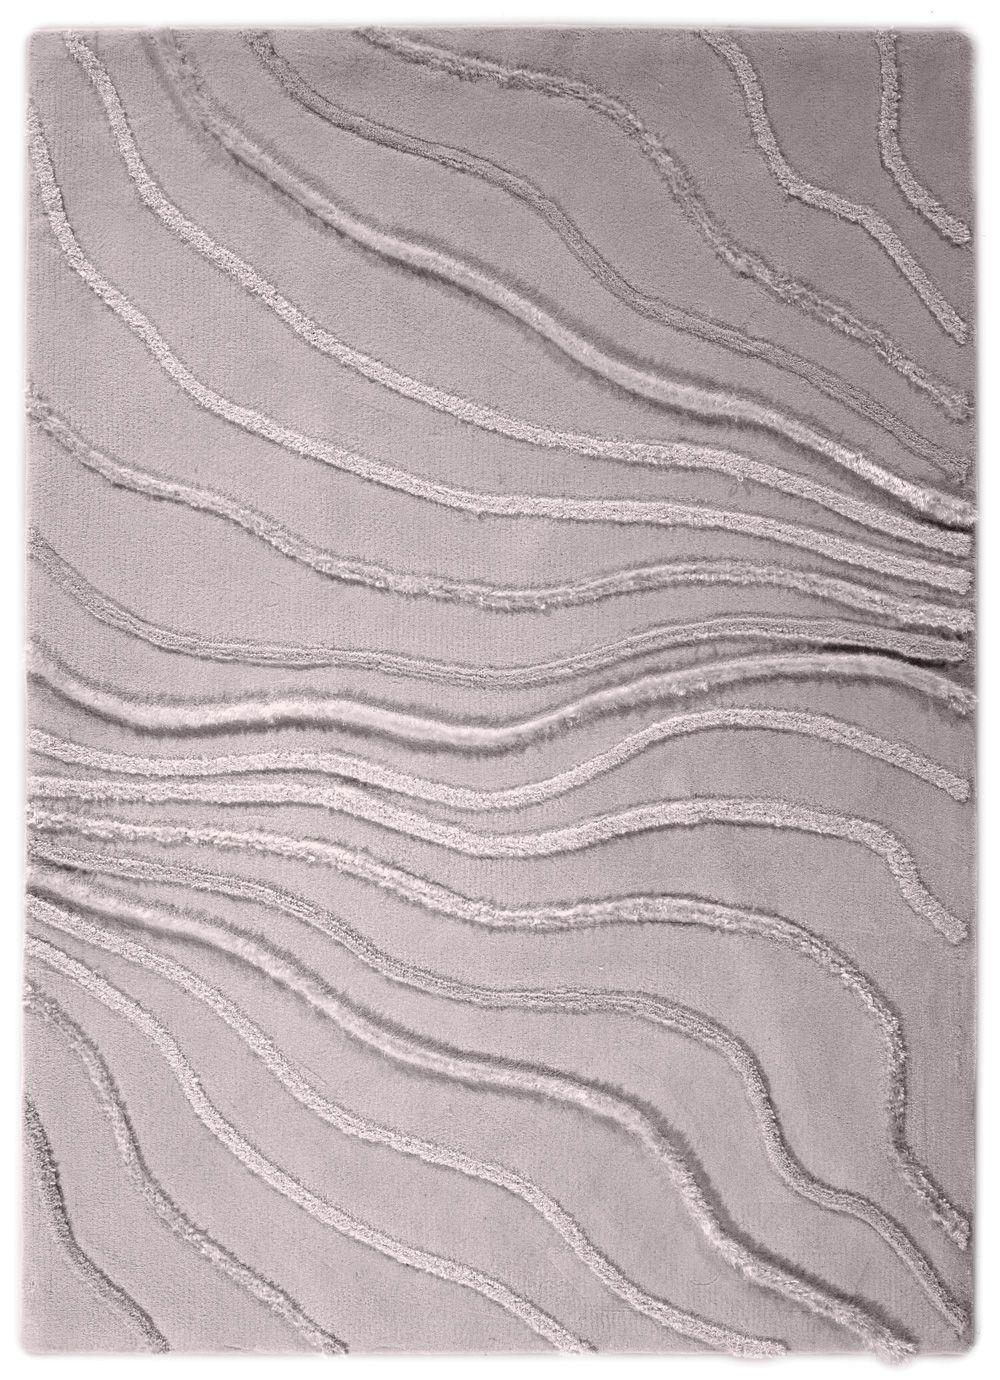 MERCER Rug By STEPEVI Vedia Lines Trim Color Silver